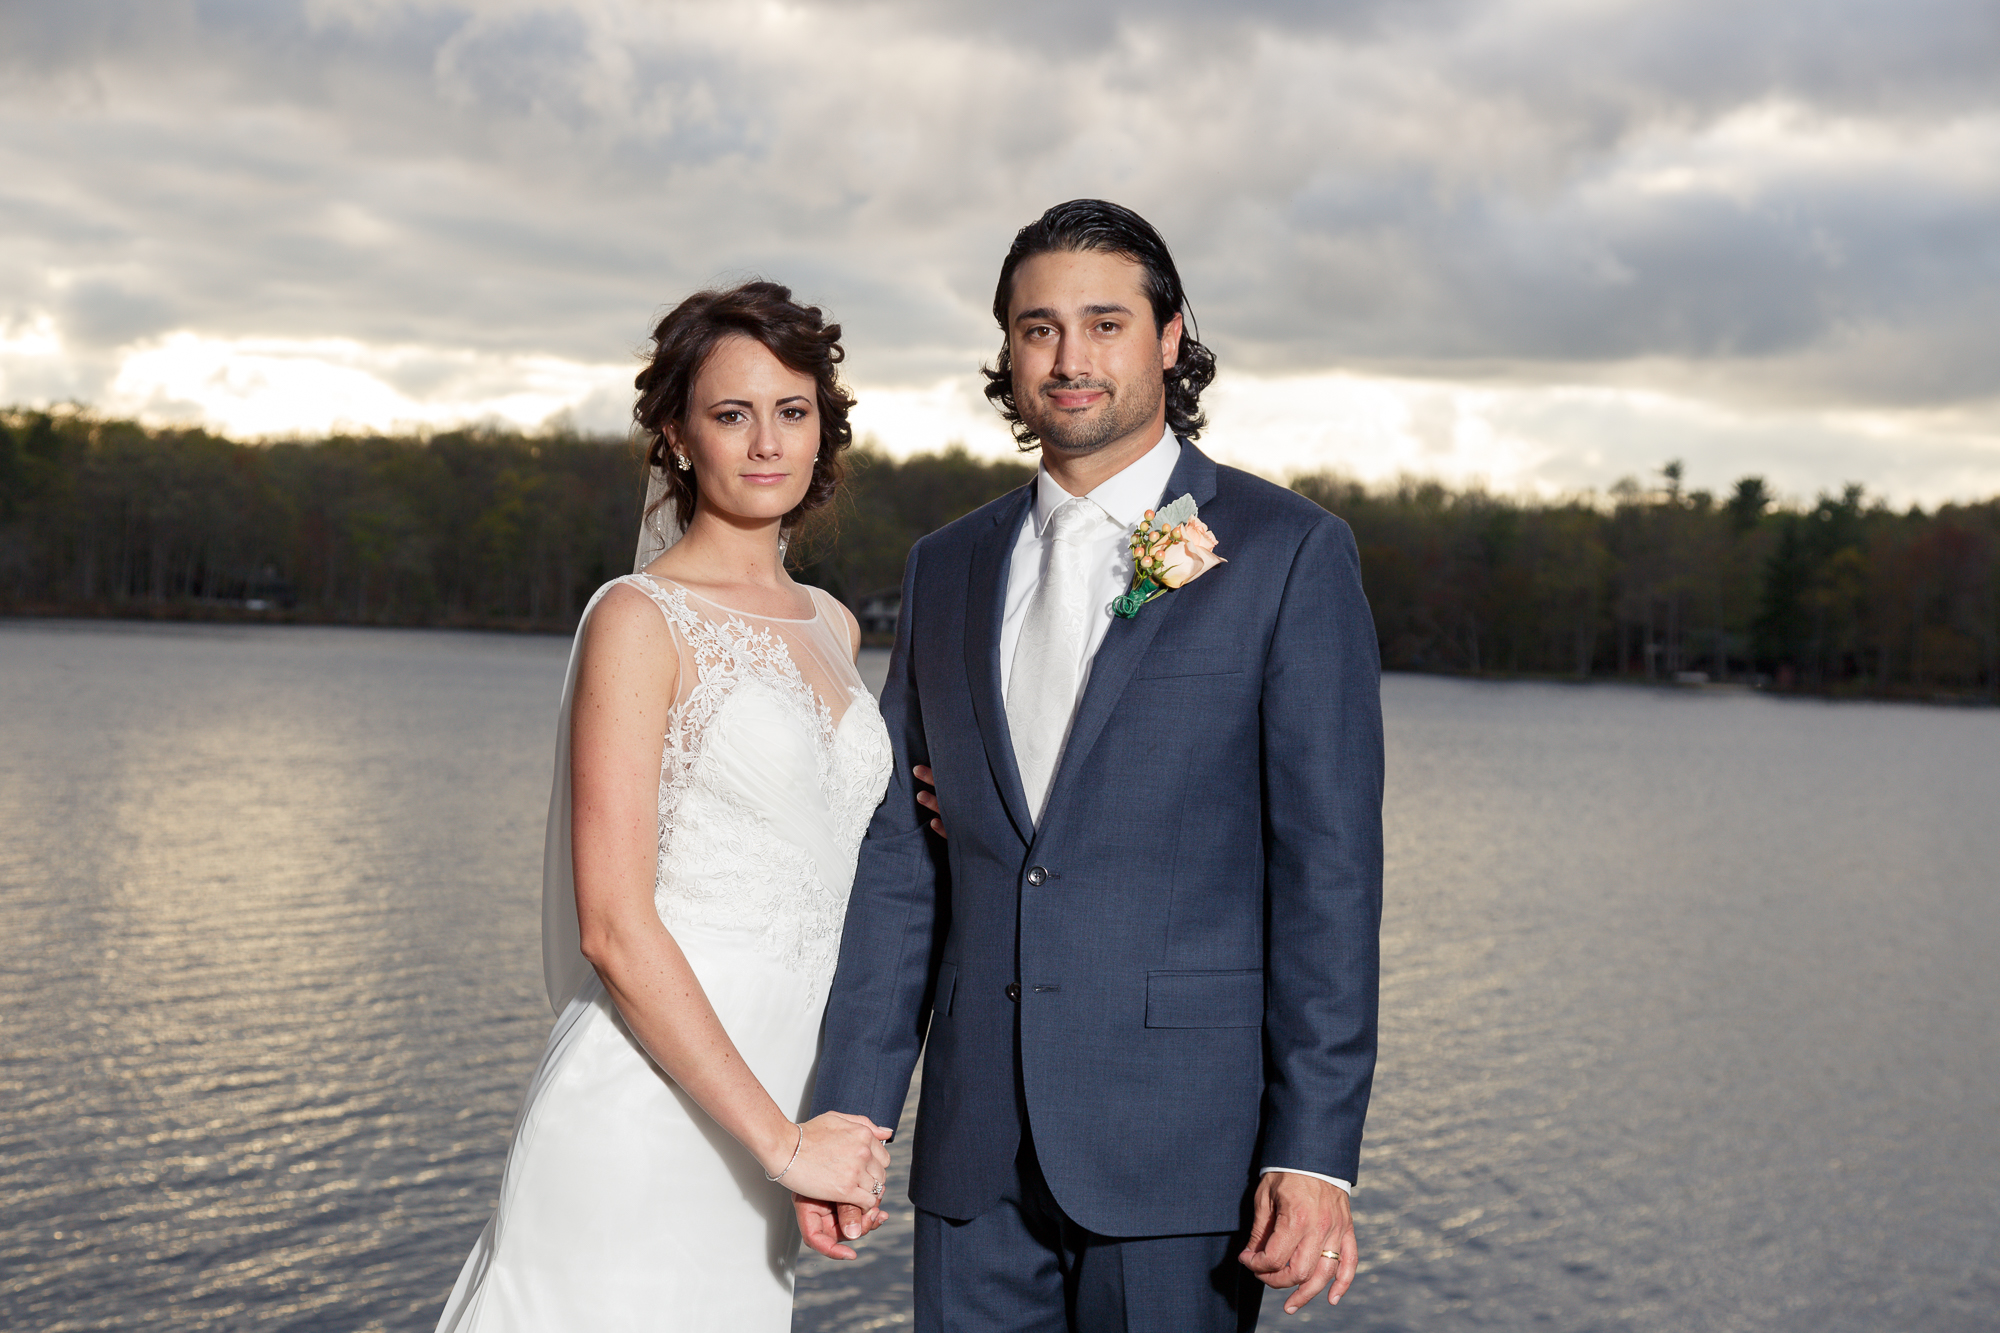 scranton-wedding-photography-zak-zavada-poconos--mattRachel-047.jpg